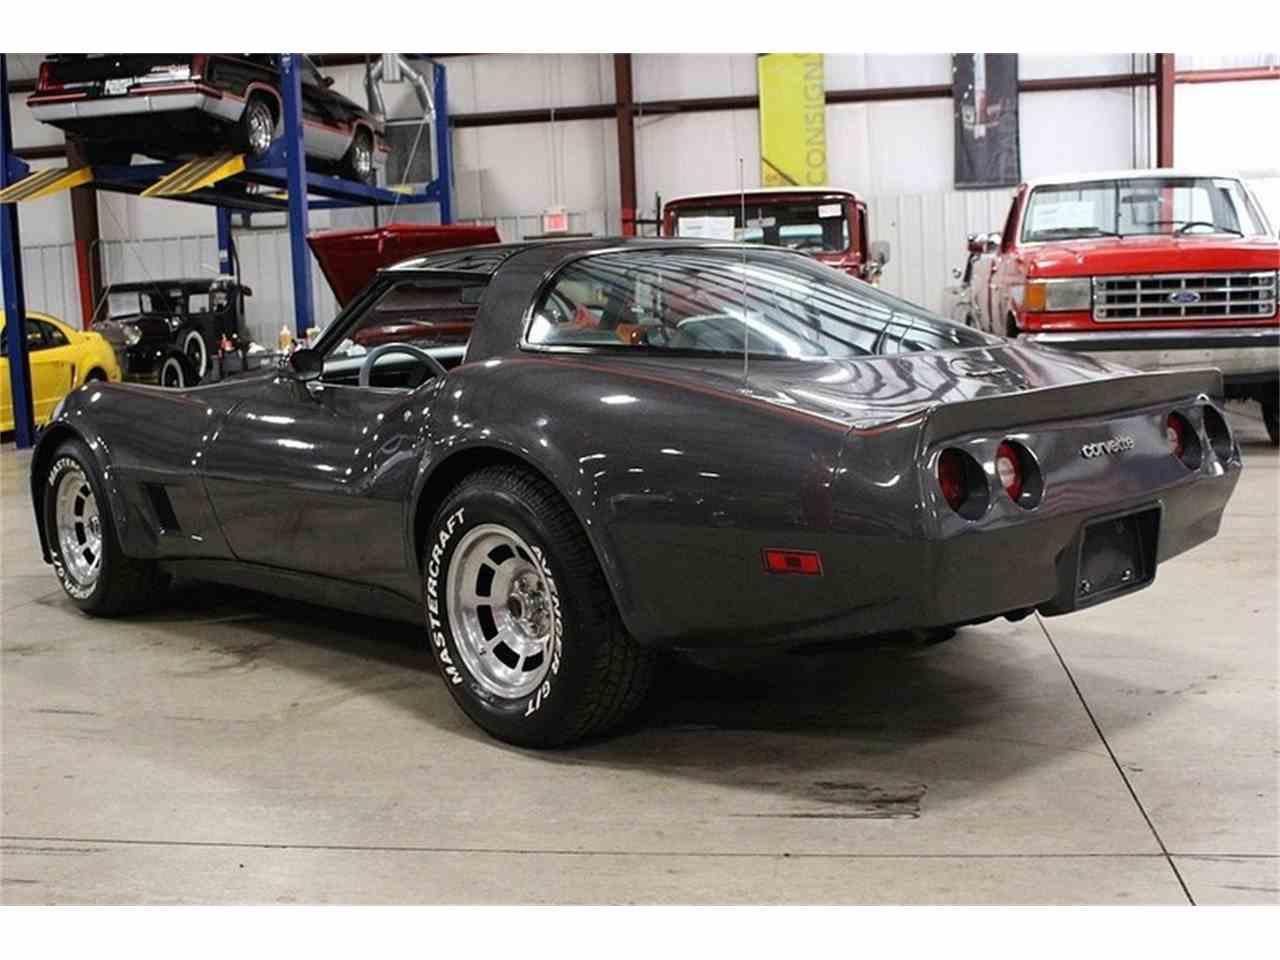 silent auction - corvette sales displays of historical and special interest corvettes, visit america's leading corvette suppliers, corvette competitions.